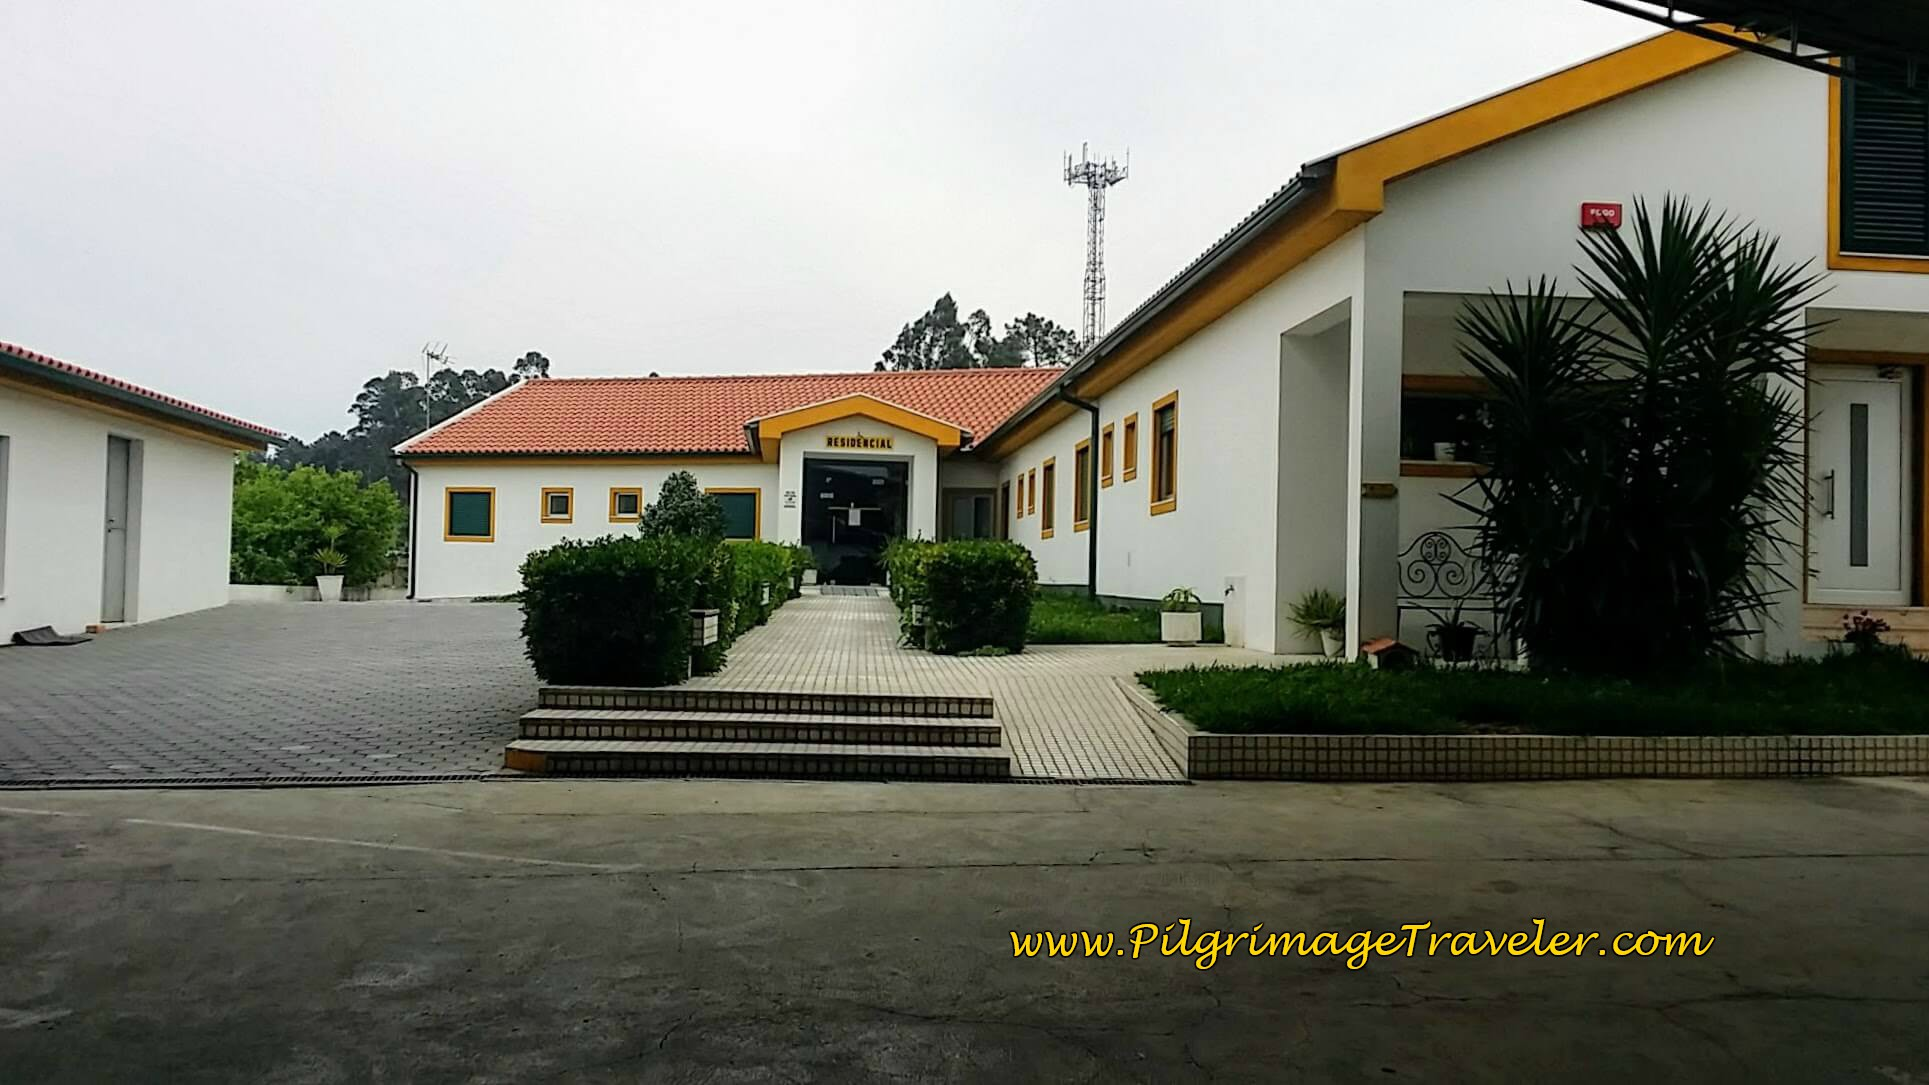 Residencial Hilario, Mealhada, Portugal